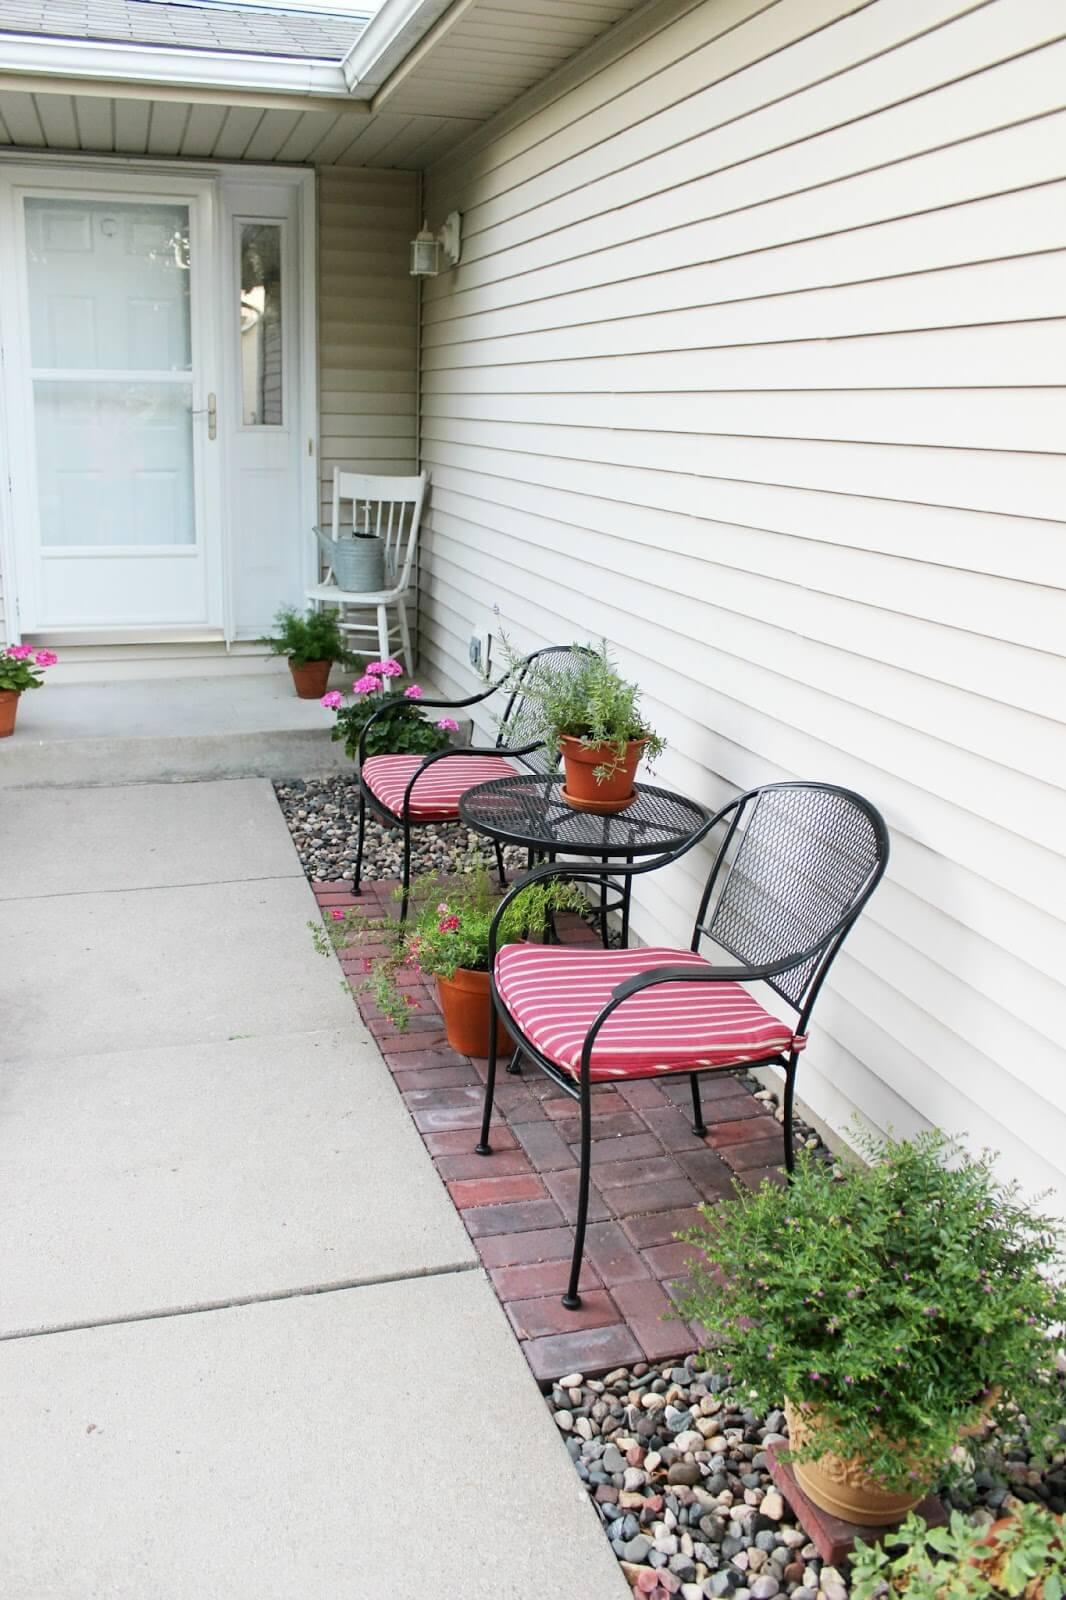 Delightful Outdoor Seating Invites Conversation